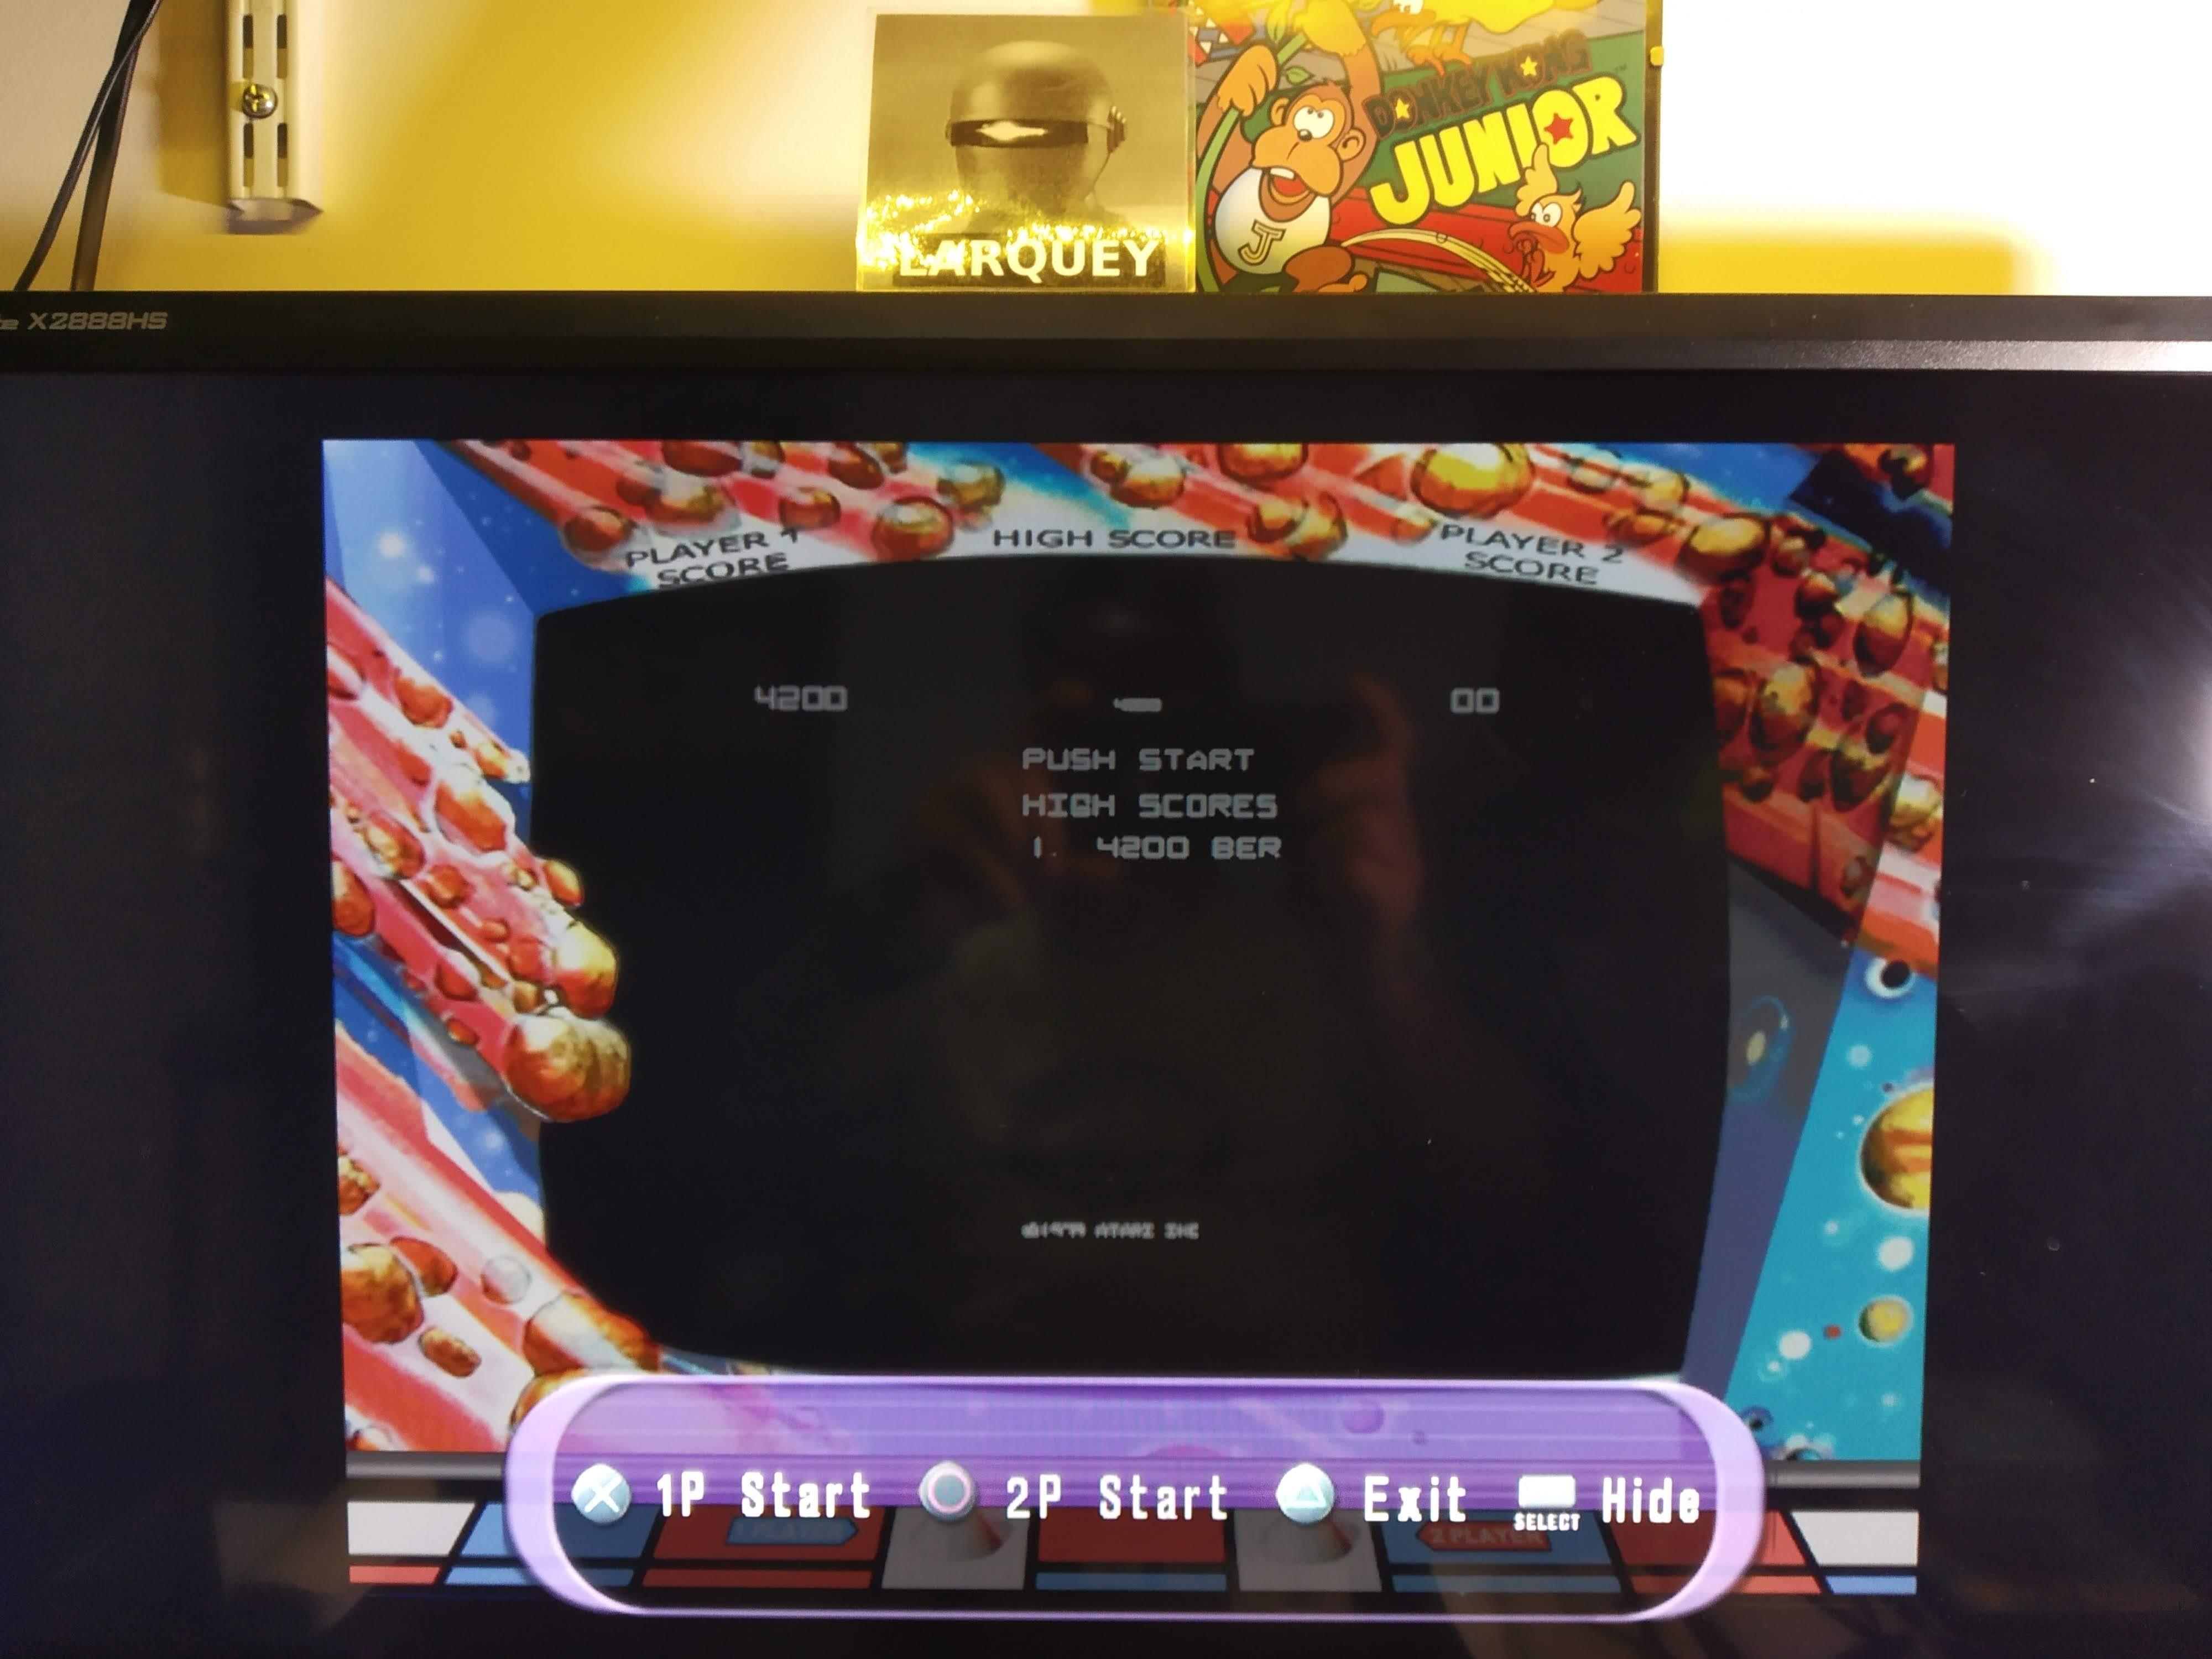 Larquey: Atari Anthology: Asteroids [Arcade Version] (Playstation 2 Emulated) 4,200 points on 2020-08-02 13:32:26